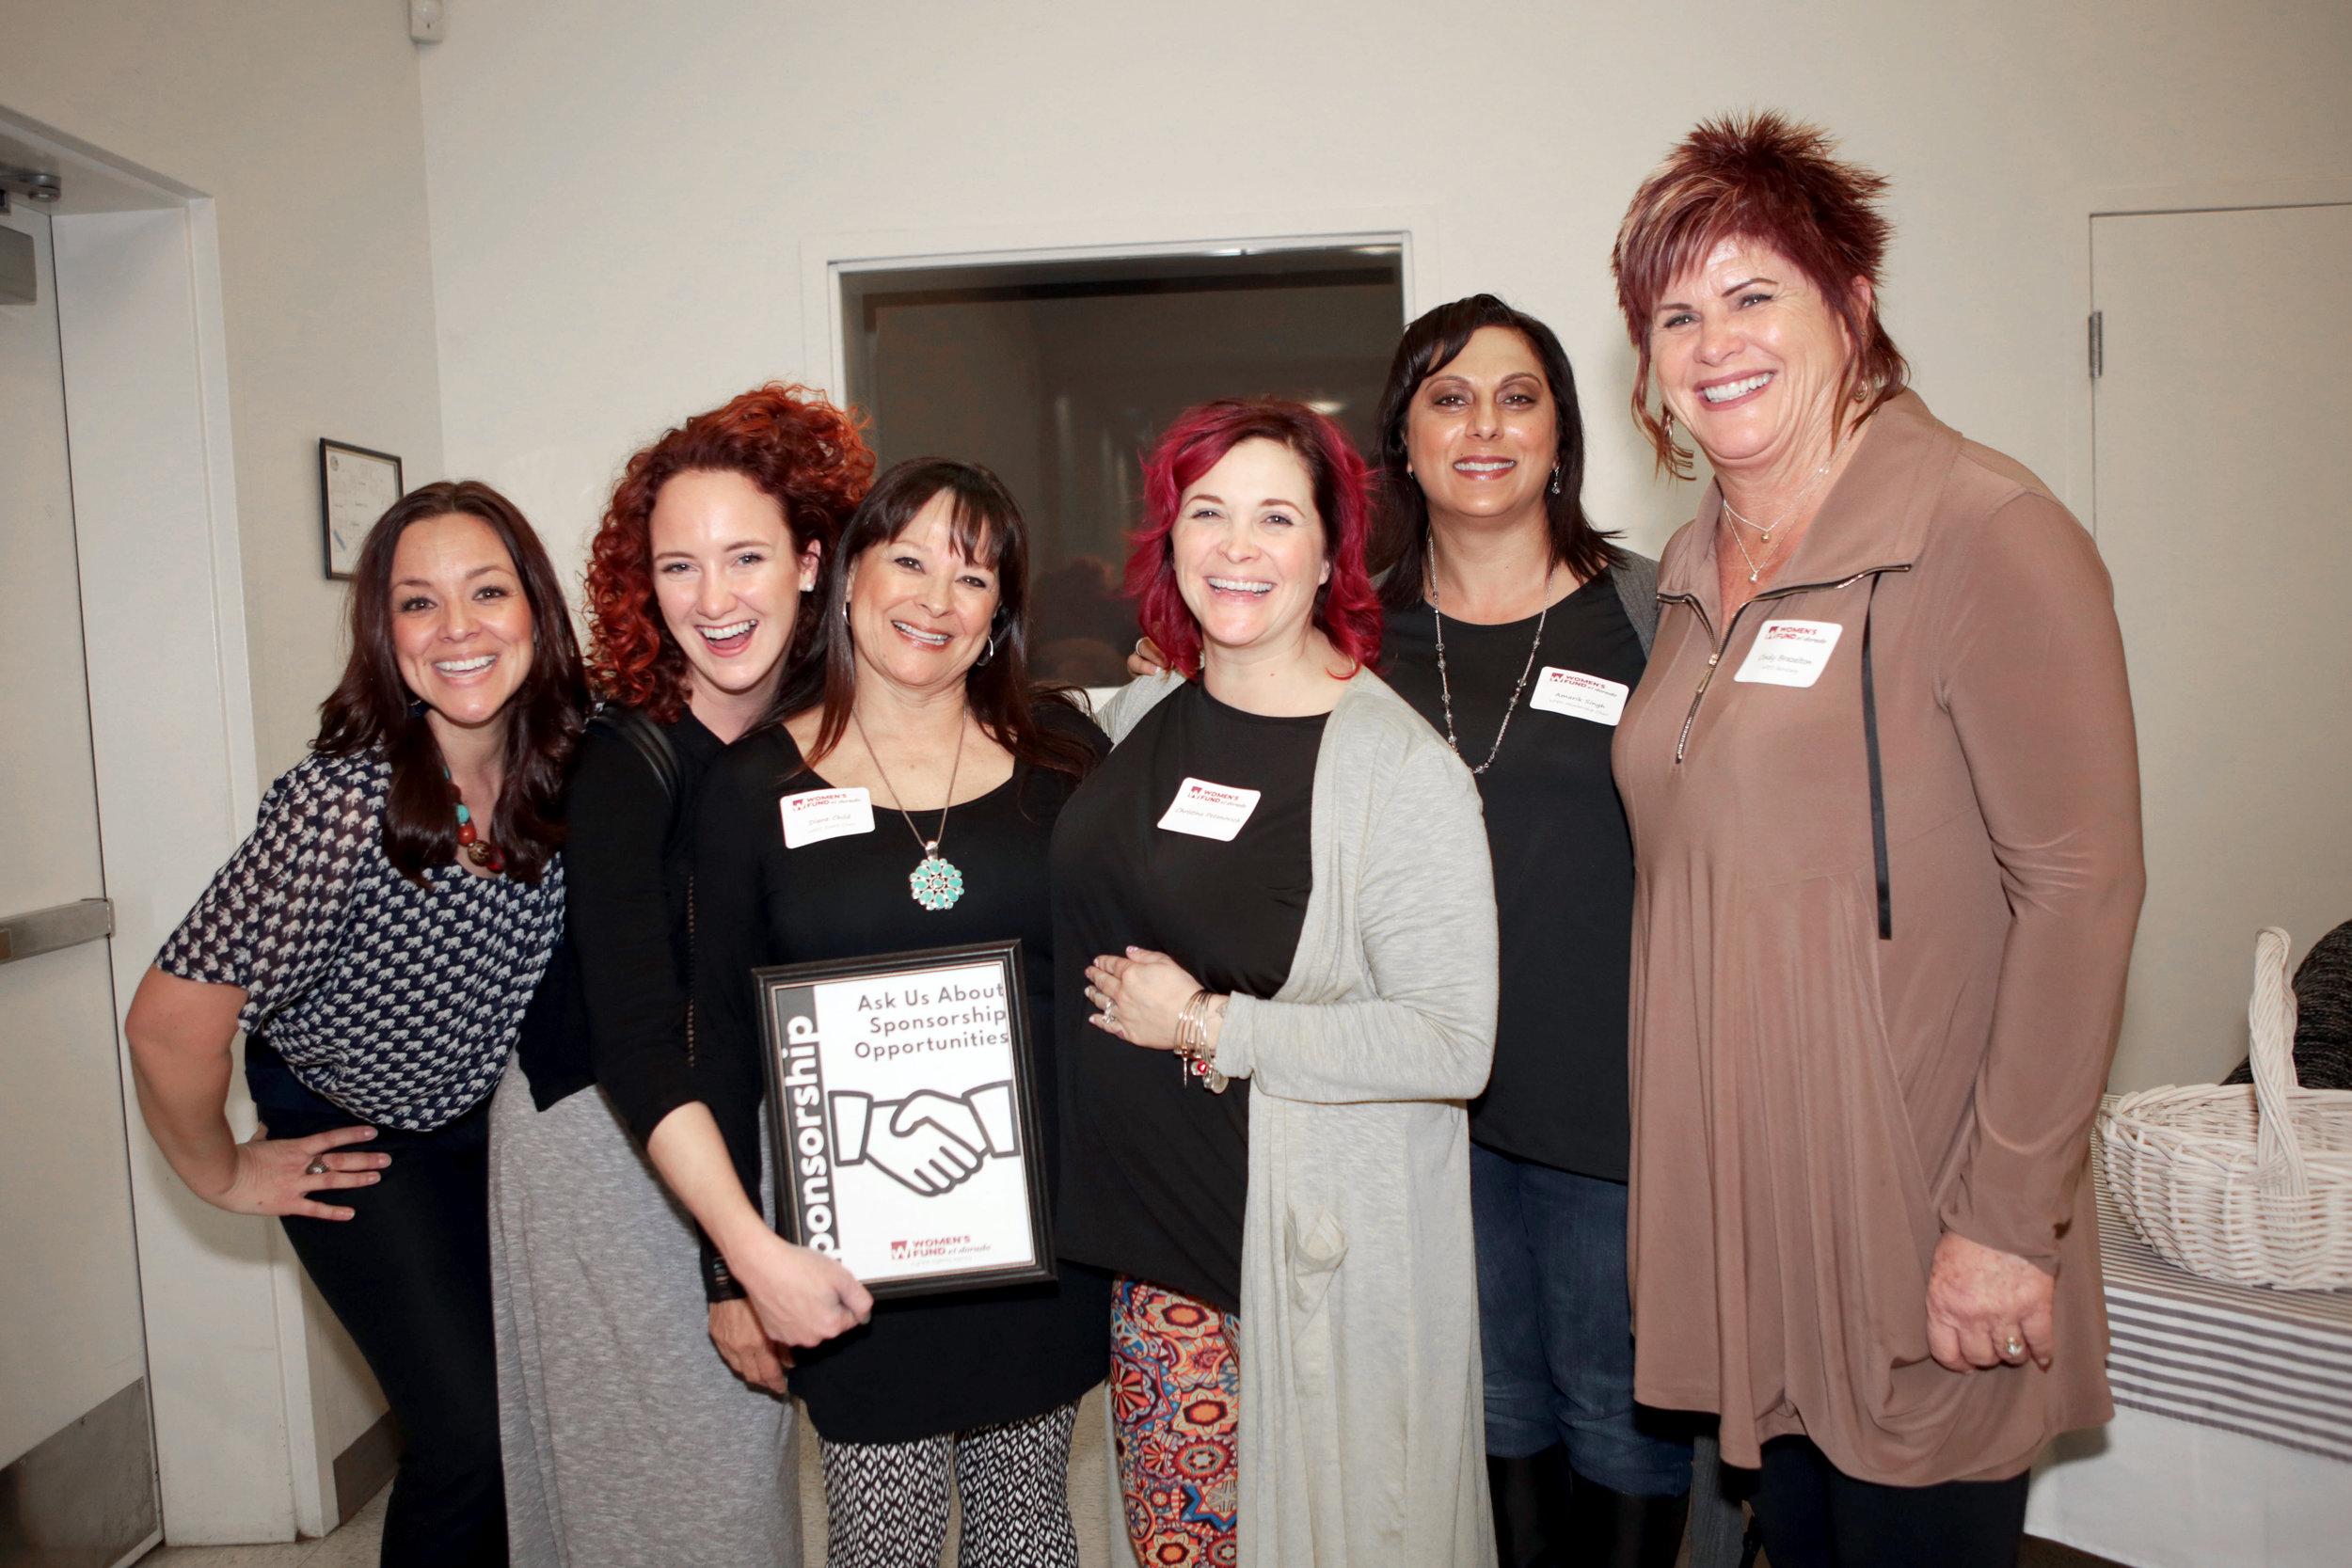 Left to Right: Amy Pooley, Cassie Bigelow, Diane Child, Christina Petanovich, Amarik Singh, Cindy Brazelton .jpg